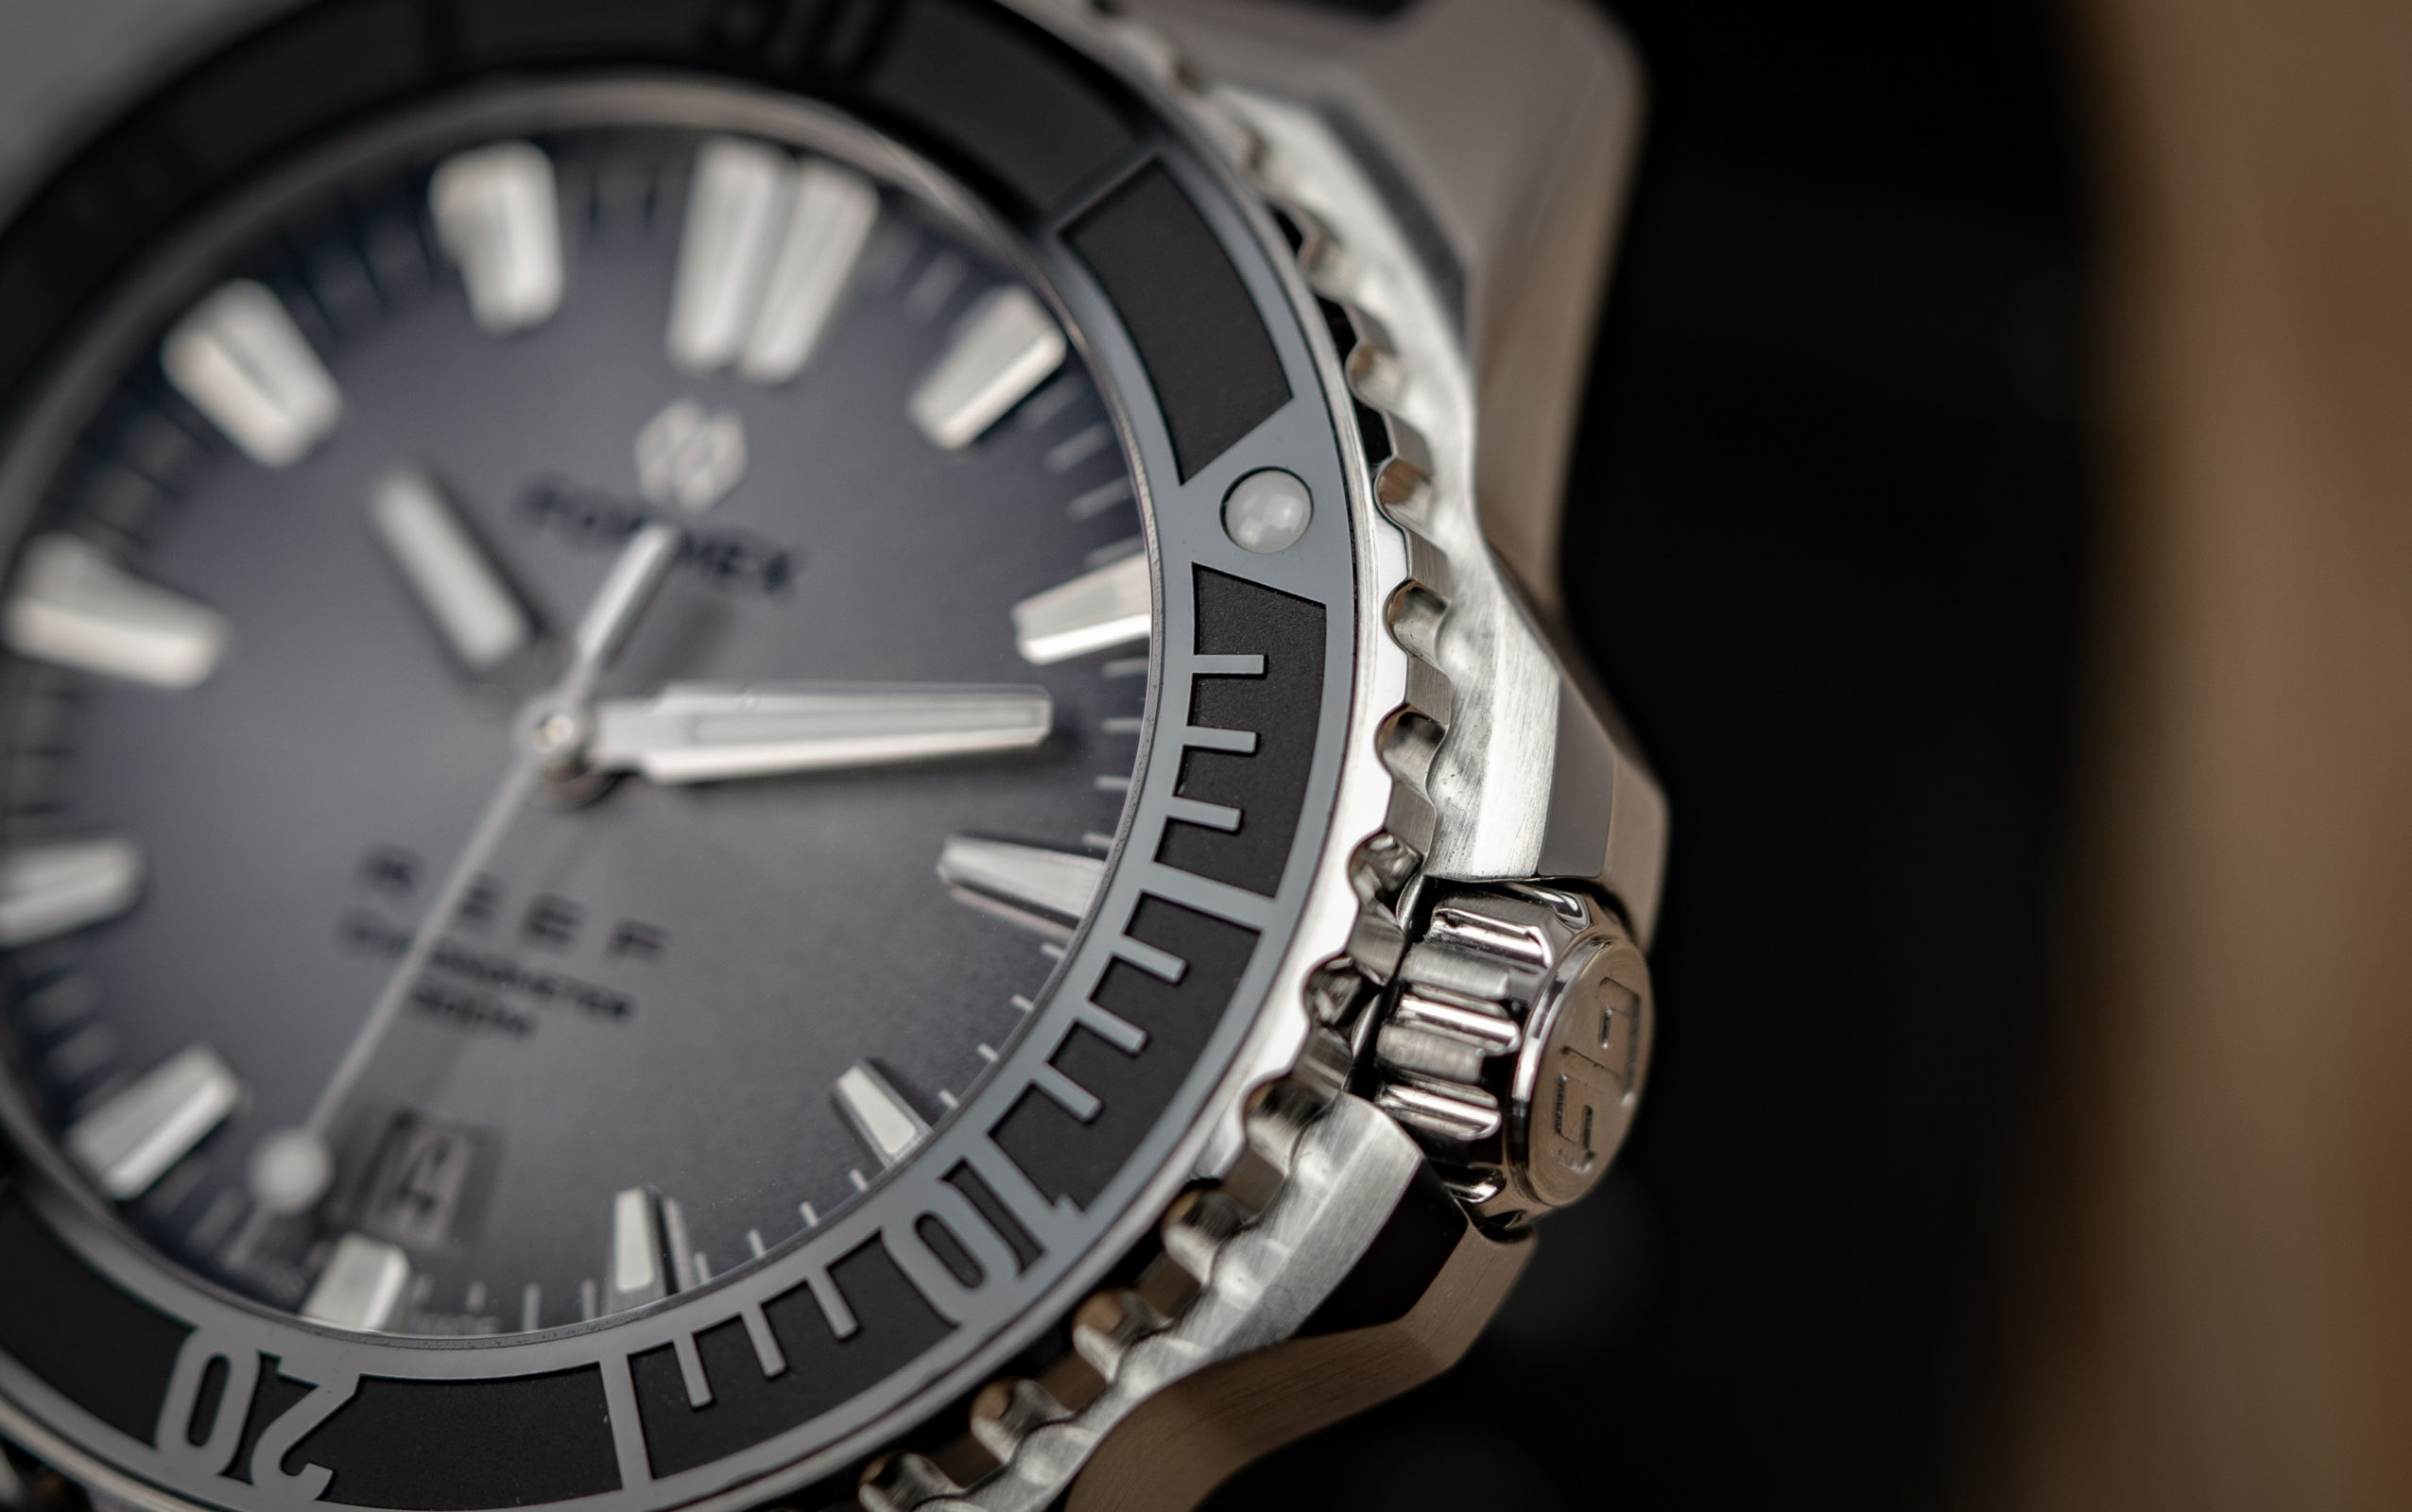 Formex-Reef-Automatik-Chronometer-300m-15-1